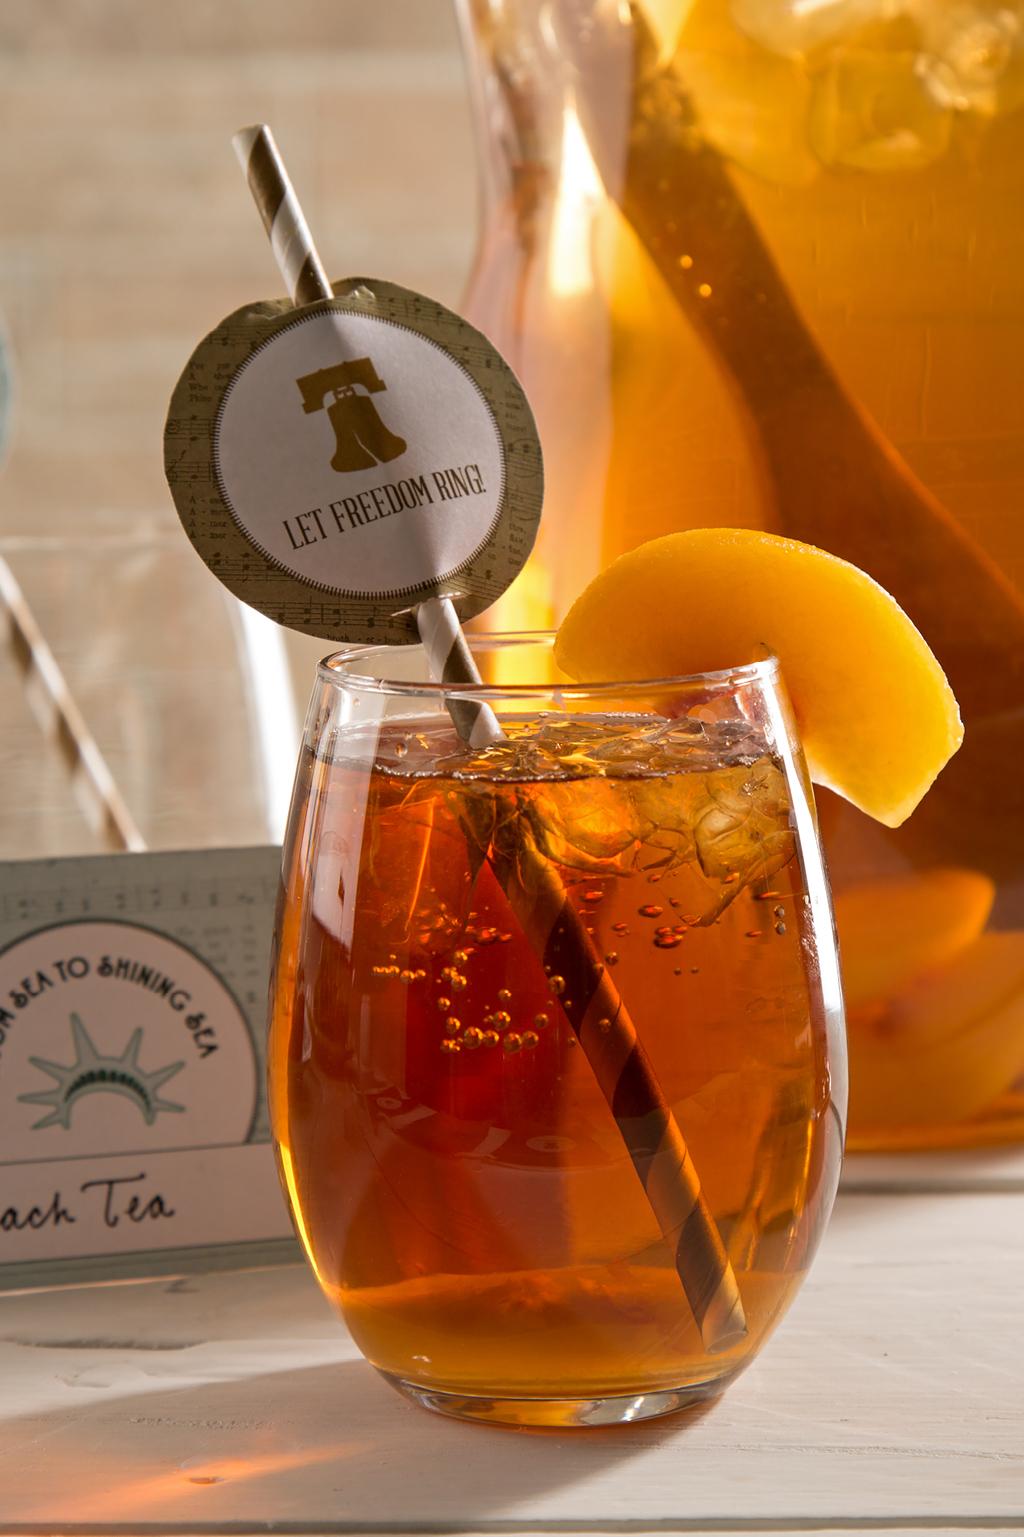 lady-liberties-peach-tea